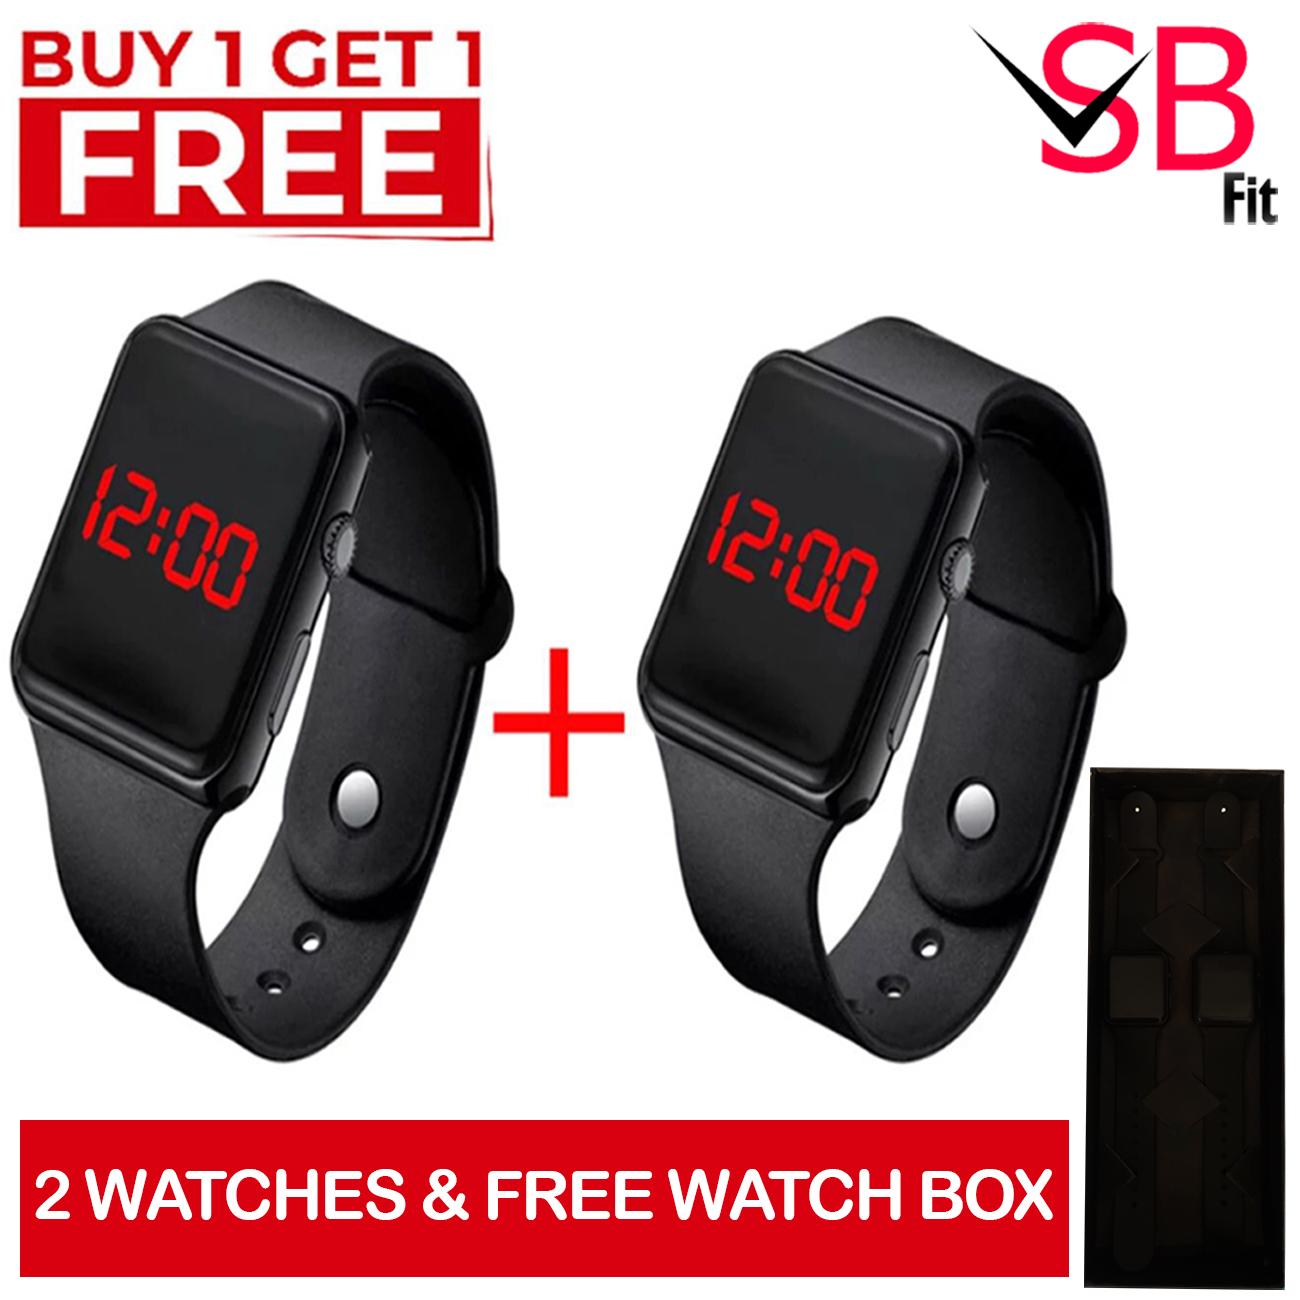 Pack of 2 Watches | Waterproof Digital Led Watch For Mens / Boys & Girls | Digital Sports Watch For Men & Women.